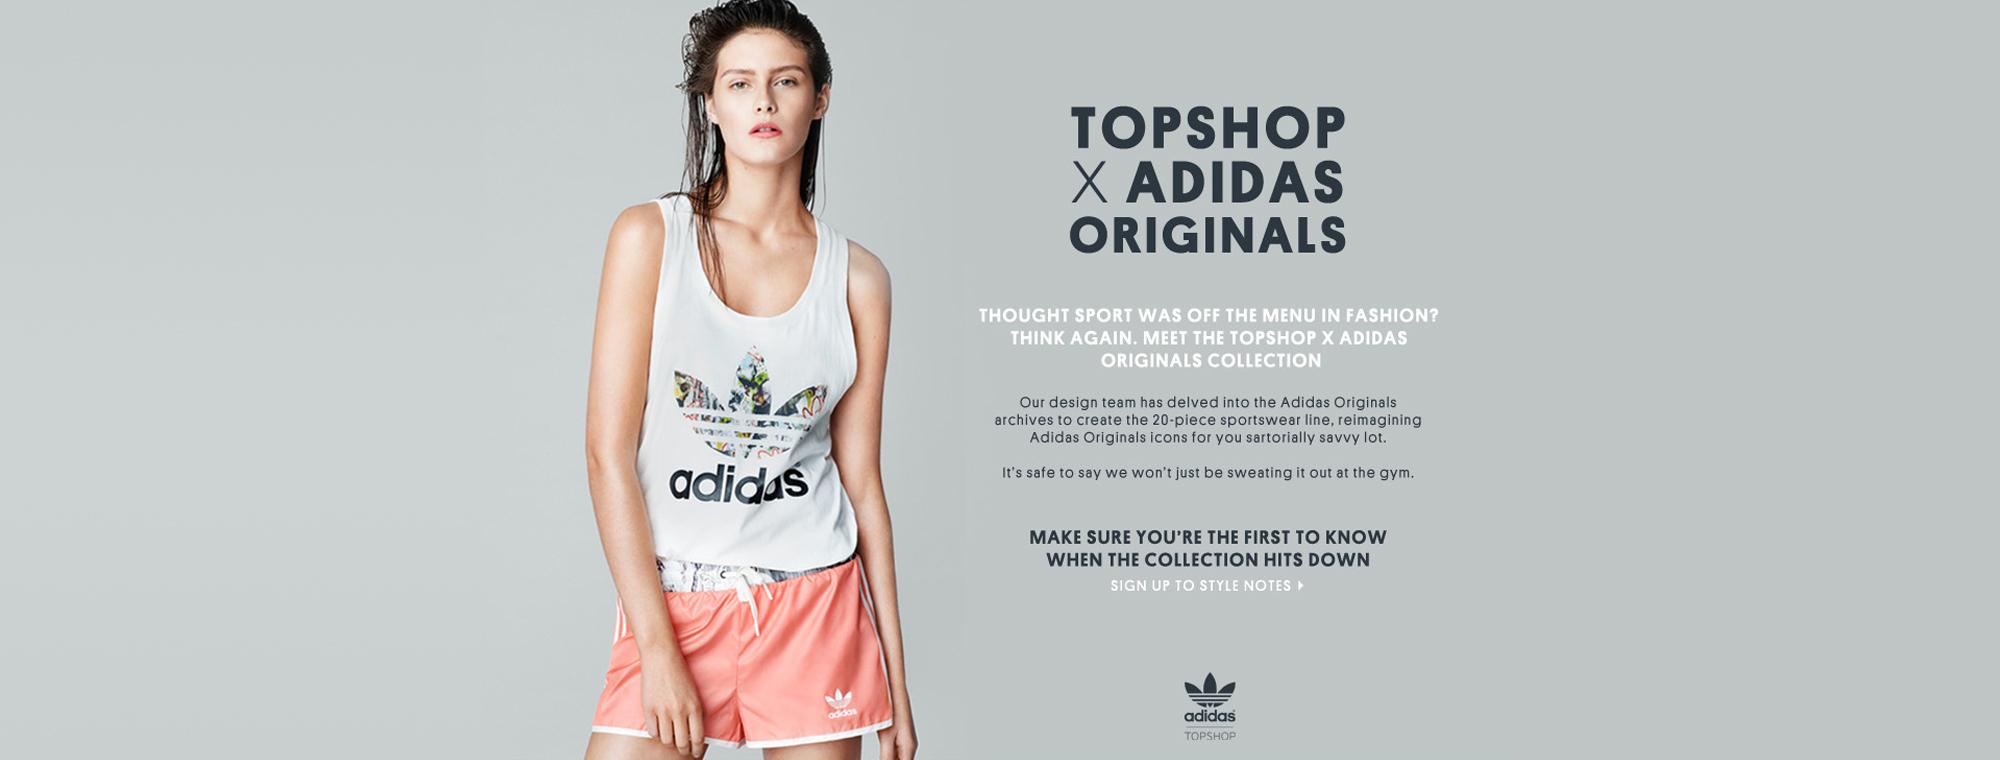 Adidas-Originals-Top-Shop-Header2